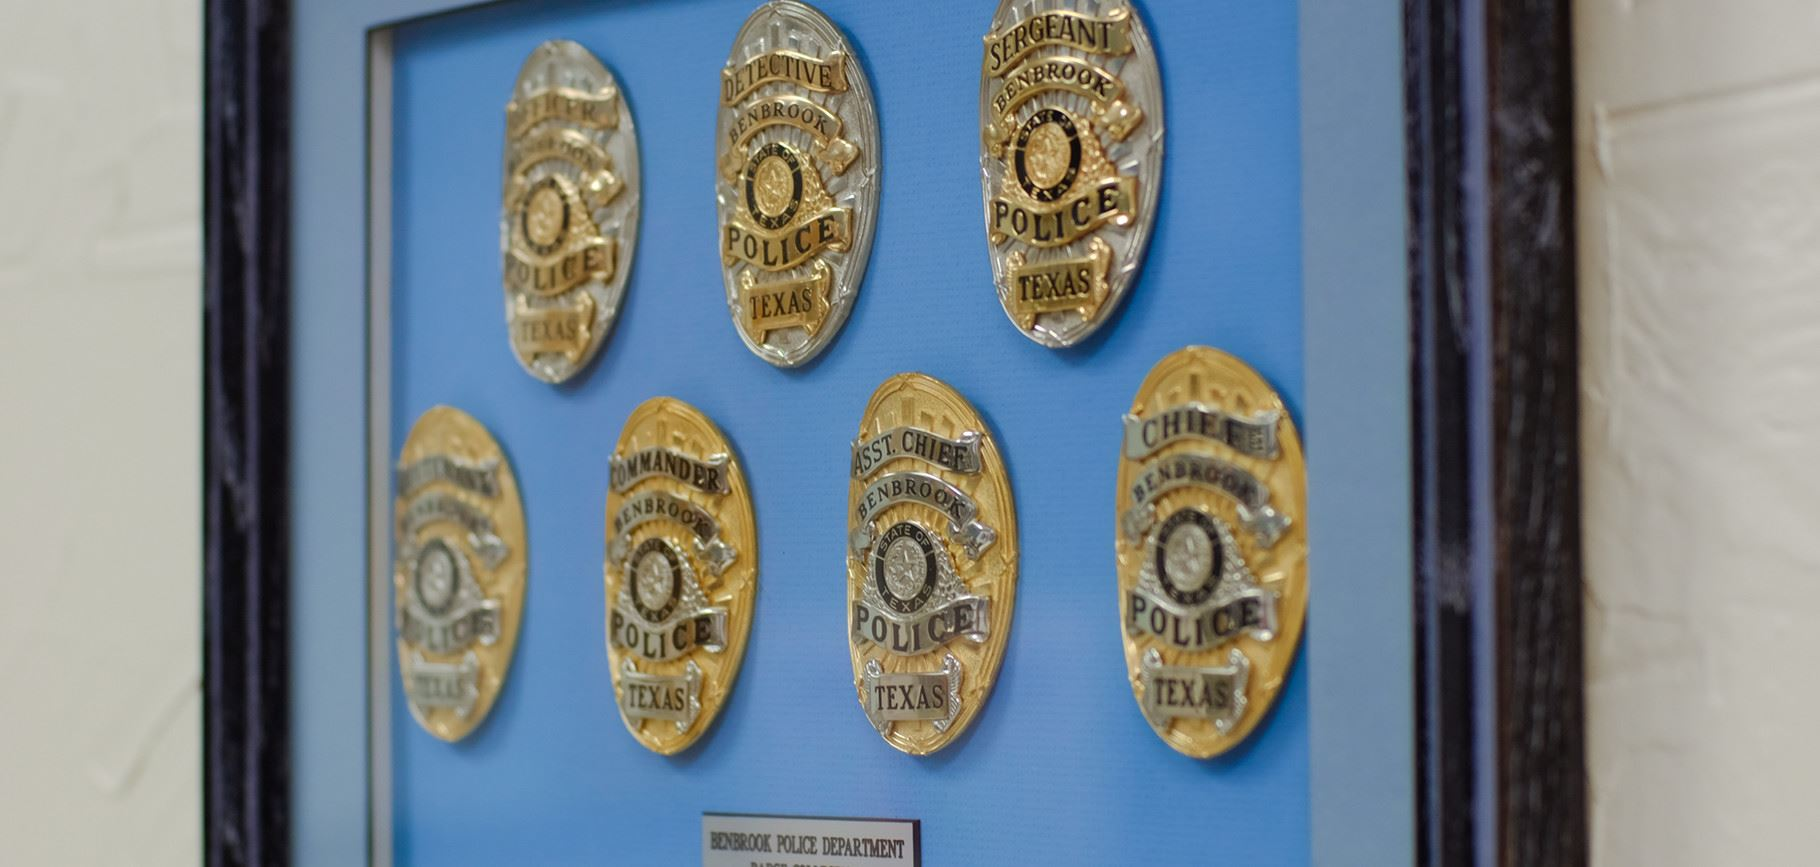 Police | Benbrook, TX - Official Website